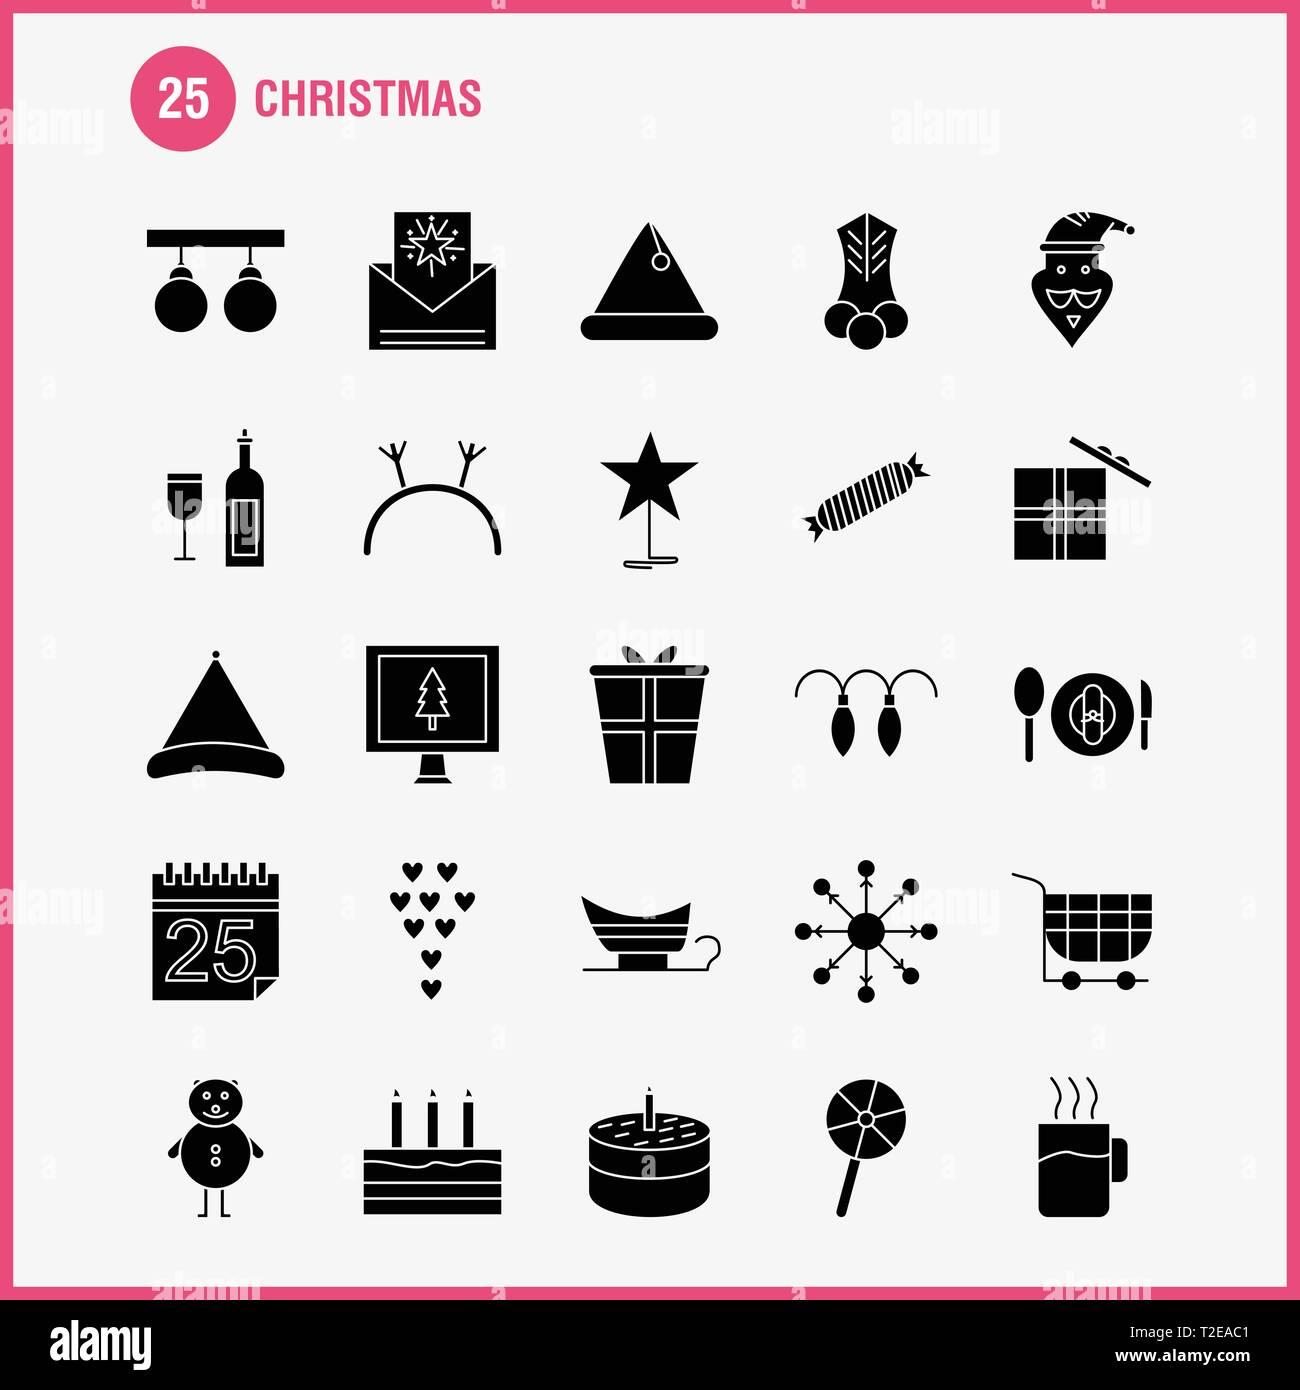 Christmas Solid Glyph Icons Set For Infographics, Mobile UX/UI Kit And Print Design. Include: Christmas Candy, Sweet, Christmas, Food, Meal, Clown, Sa - Stock Vector